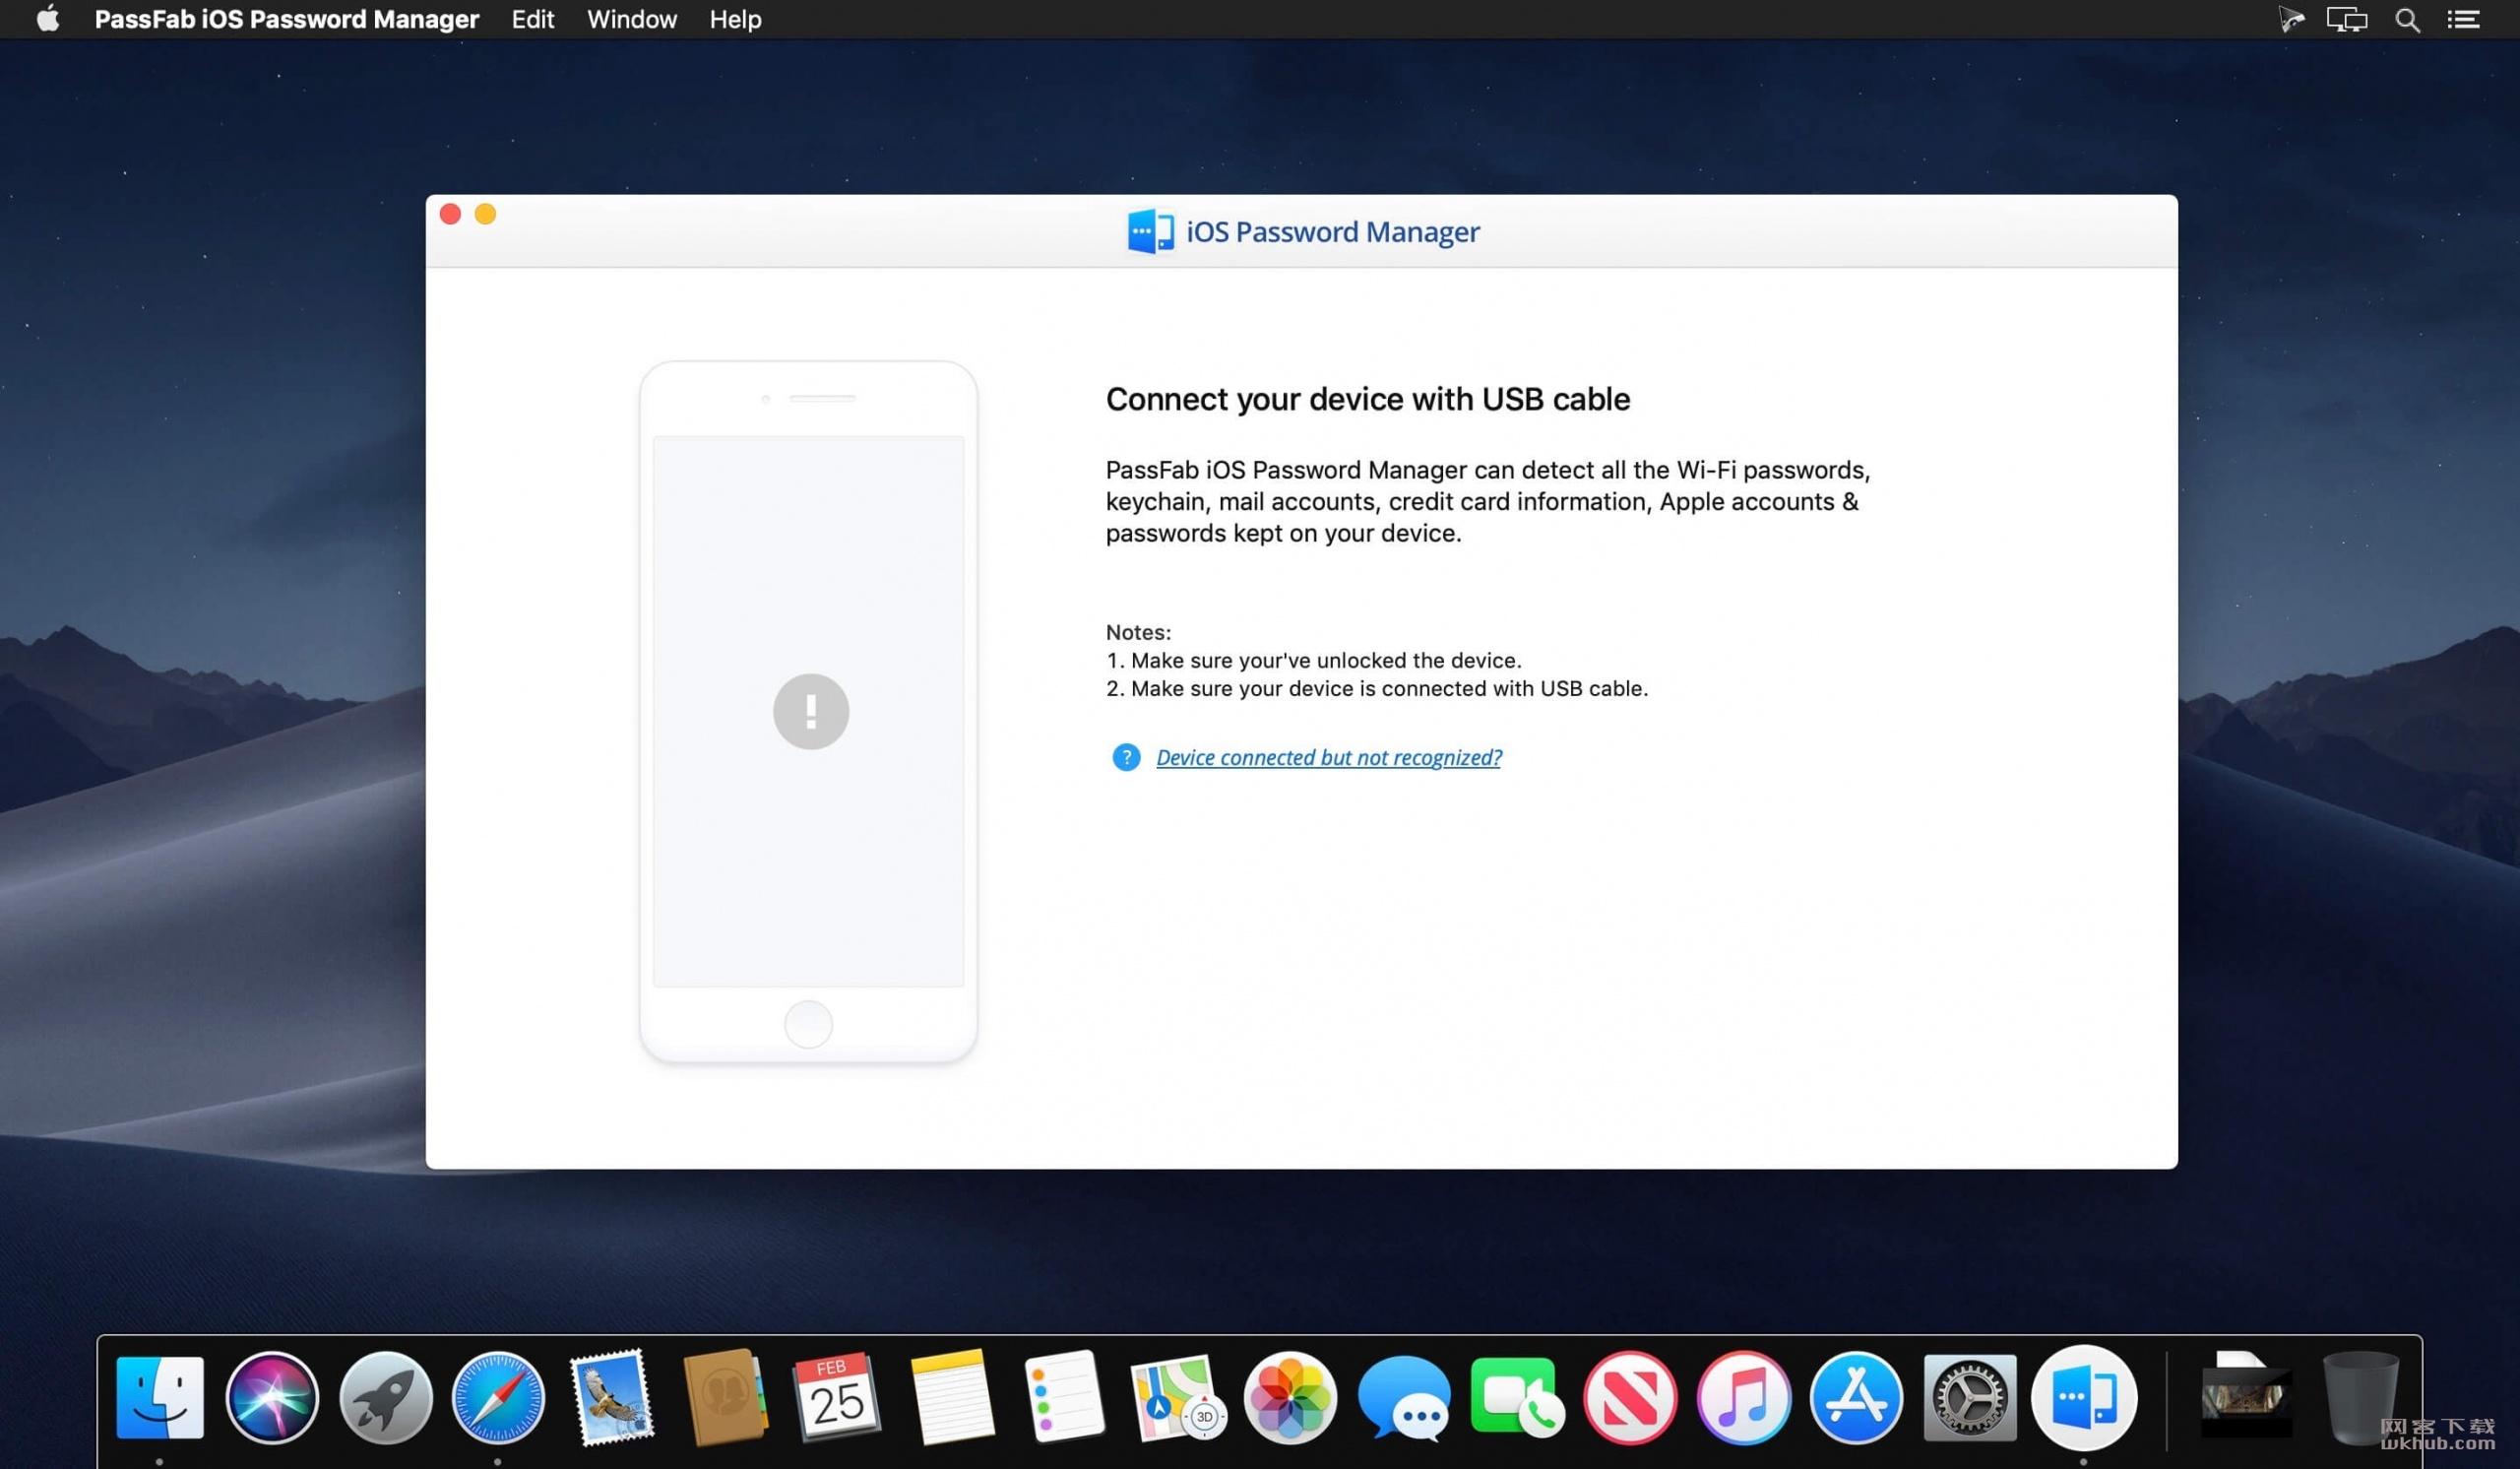 PassFab iOS Password Manager 1.3.2 iOS密码管理工具